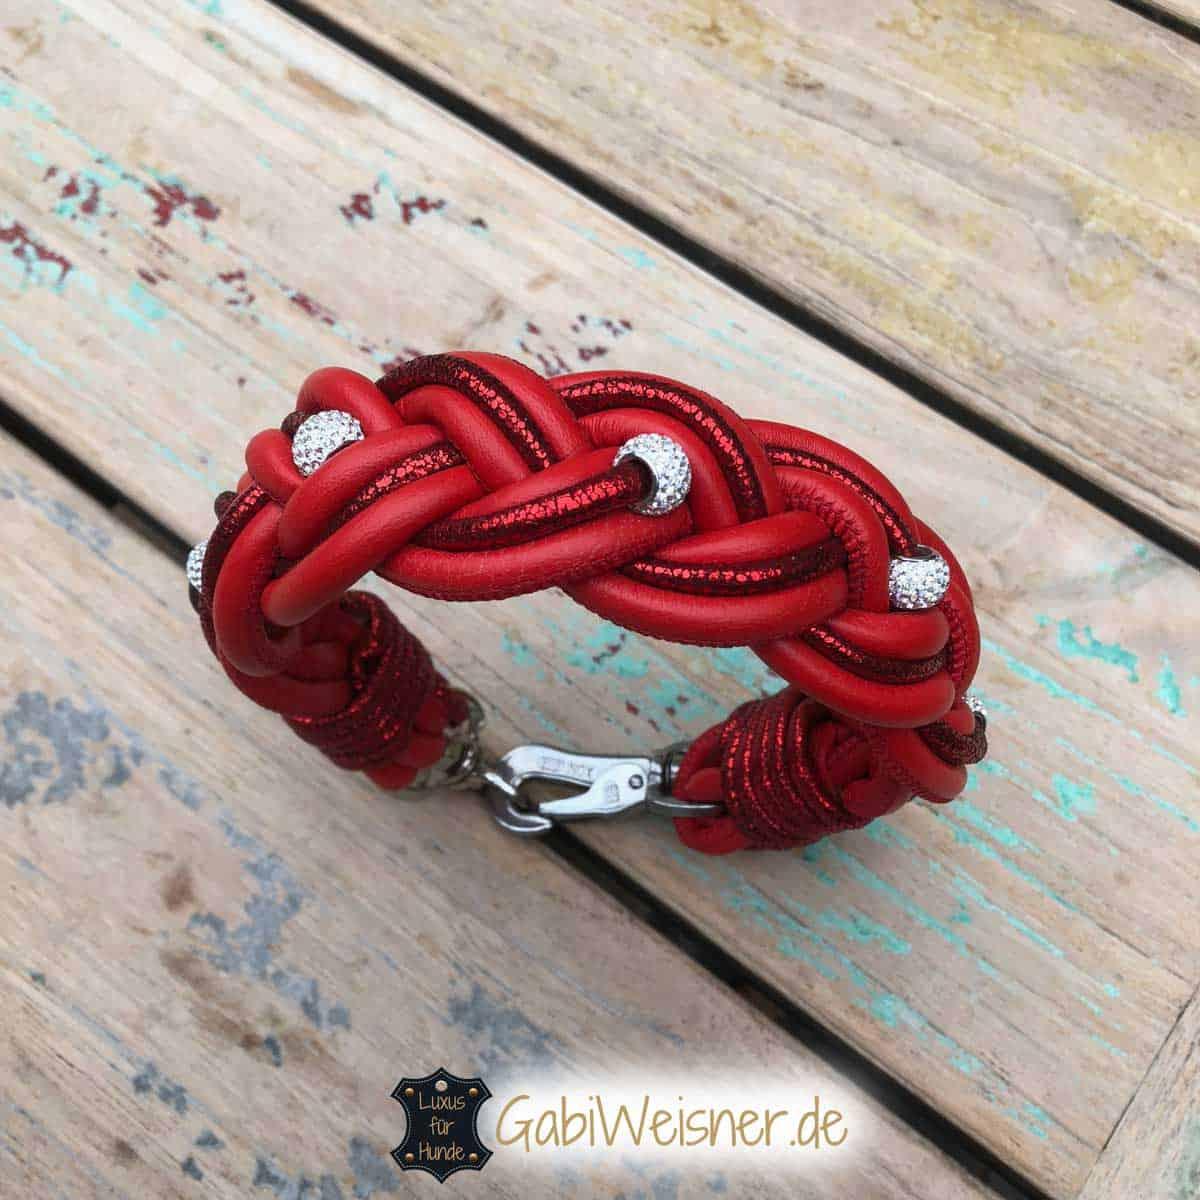 Hundehalsband Leder in Rot mit Strass und Glitzer